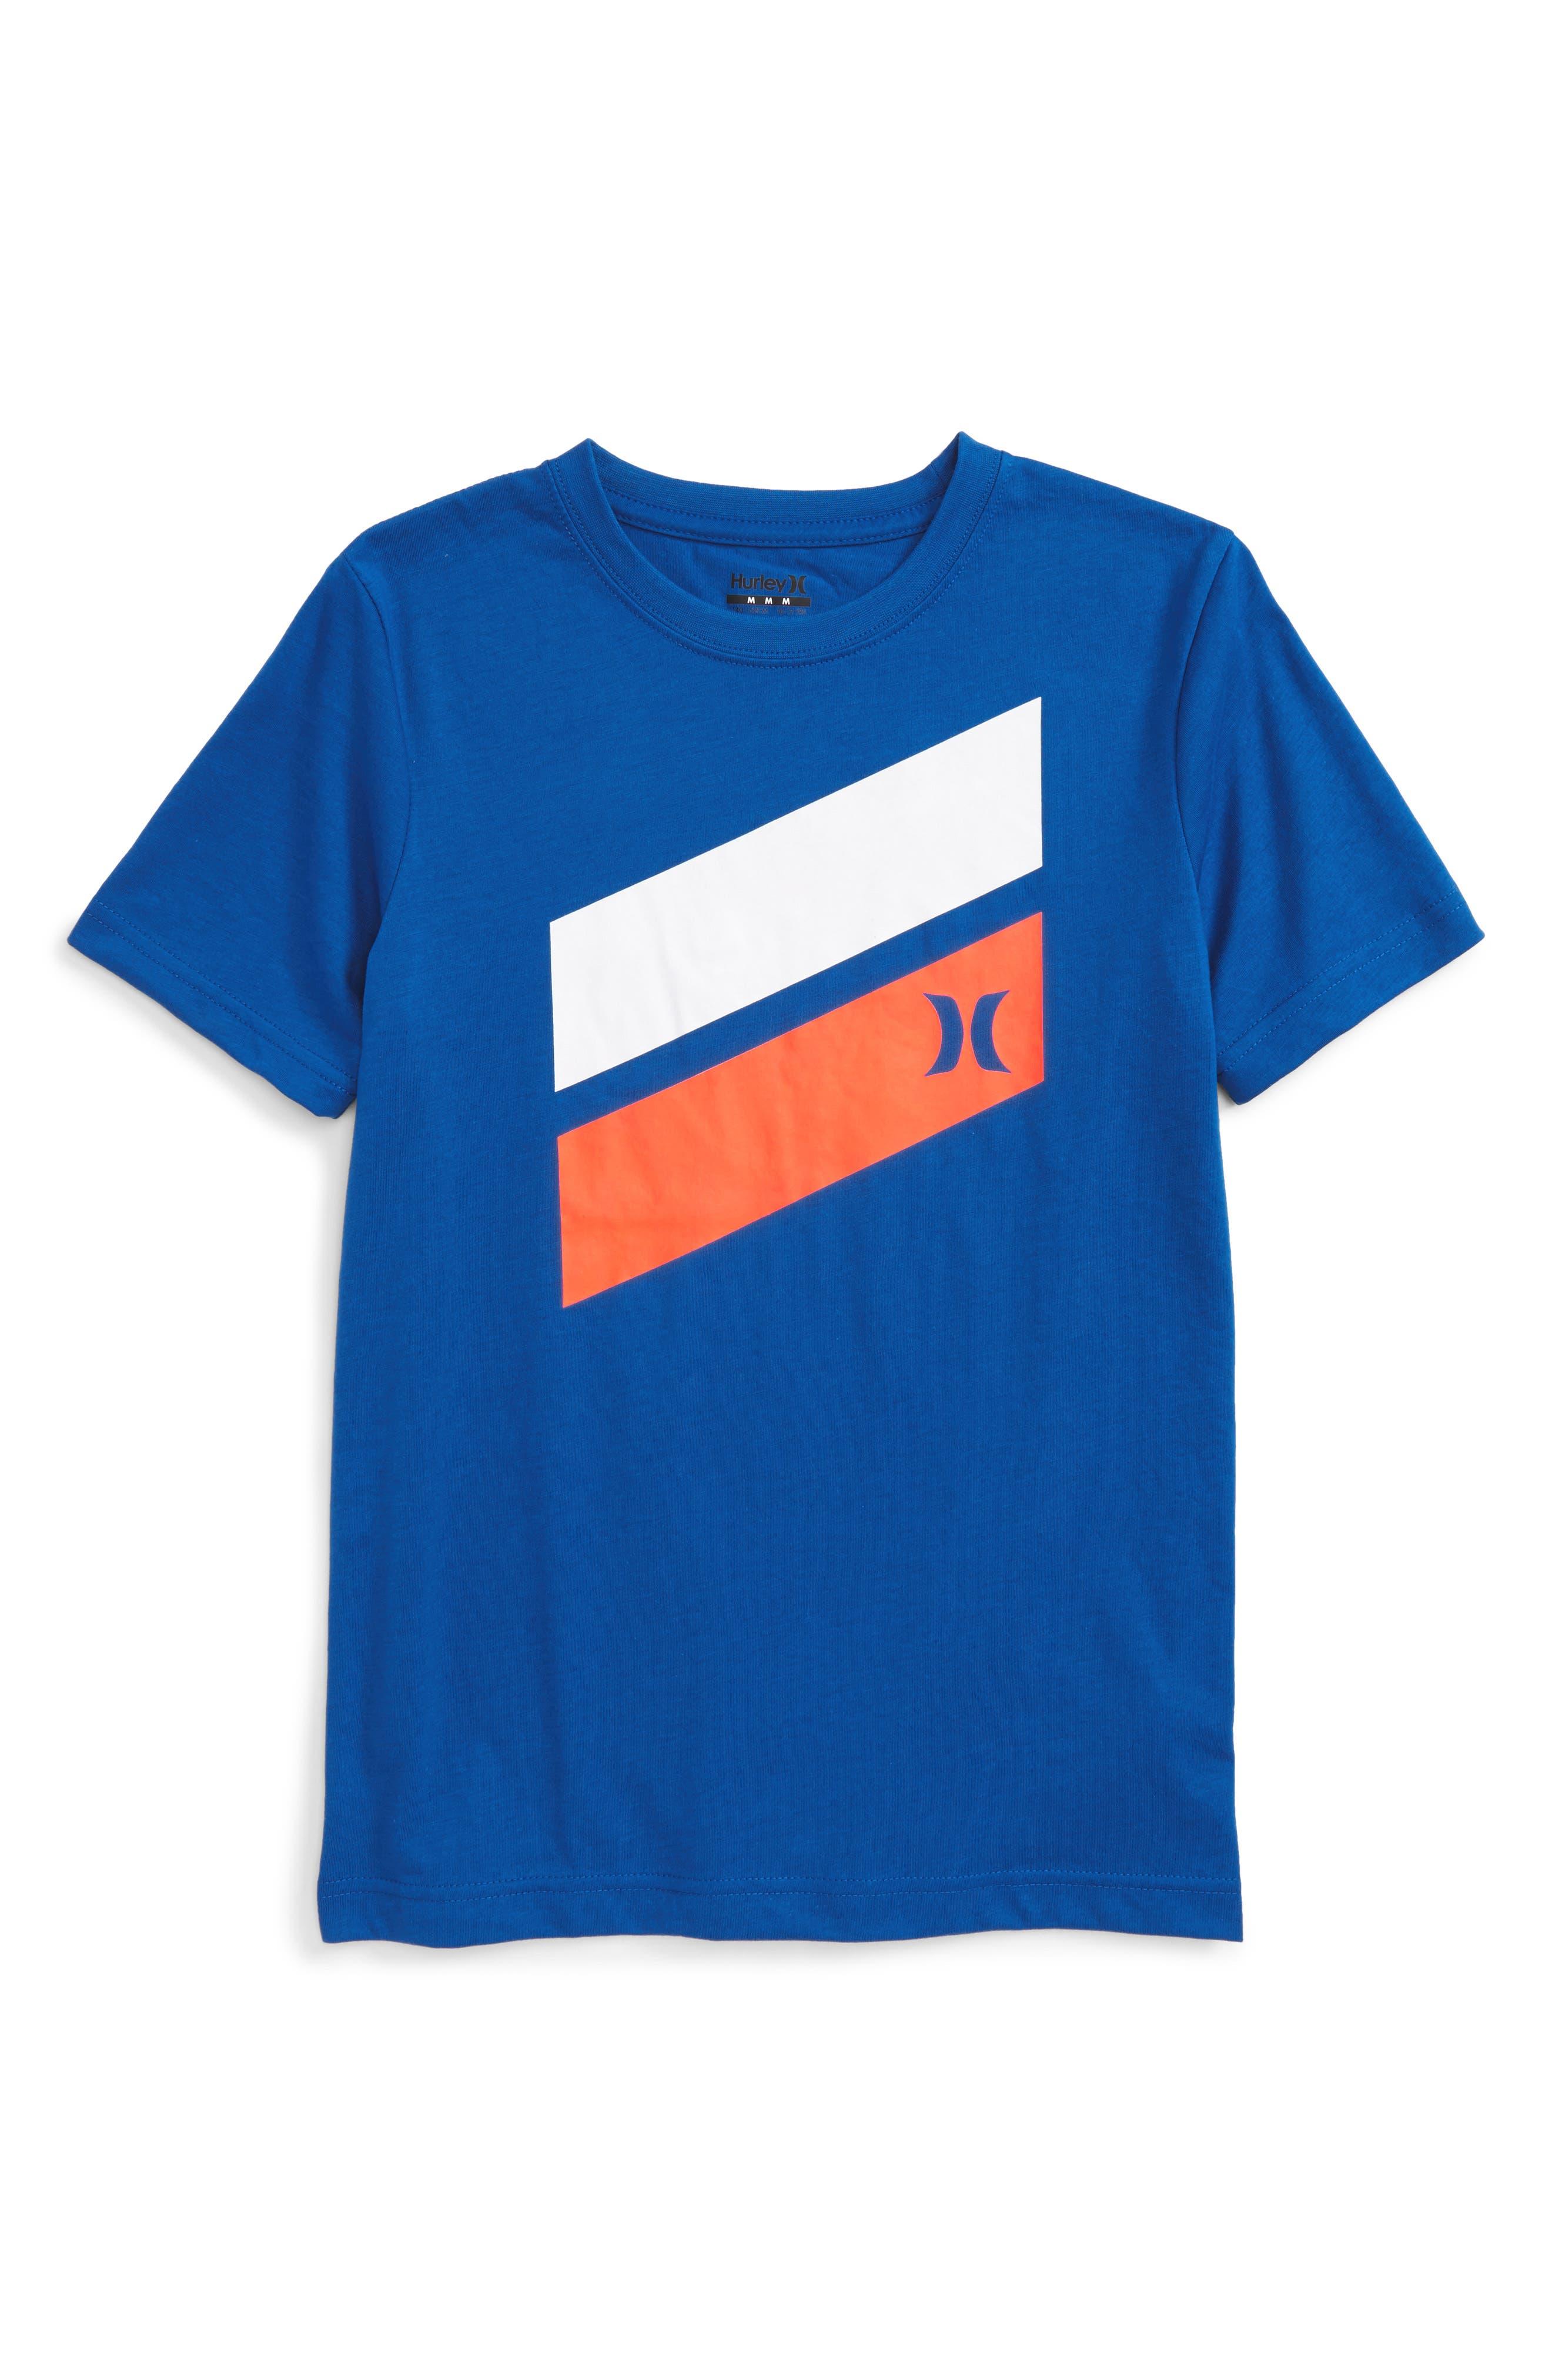 Hurley 'Icon Slash' Graphic T-Shirt (Toddler Boys, Little Boys & Big Boys)